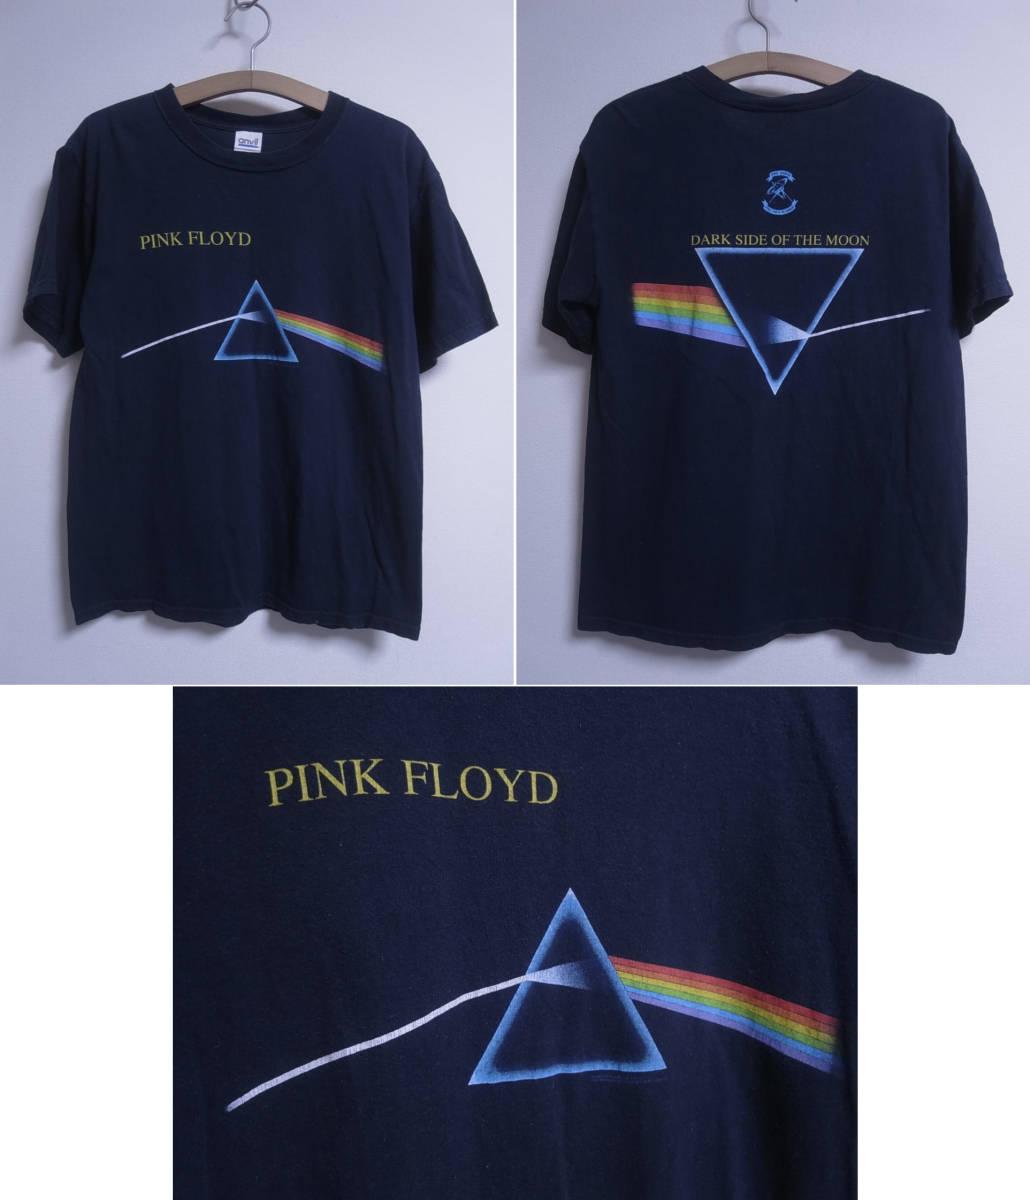 V6/3170★バンドT★ピンクフロイド PINK FLOYD 黒 半袖 Tシャツ DARK SIDE OF THE MOON #狂気 #両面プリント☆M_画像1